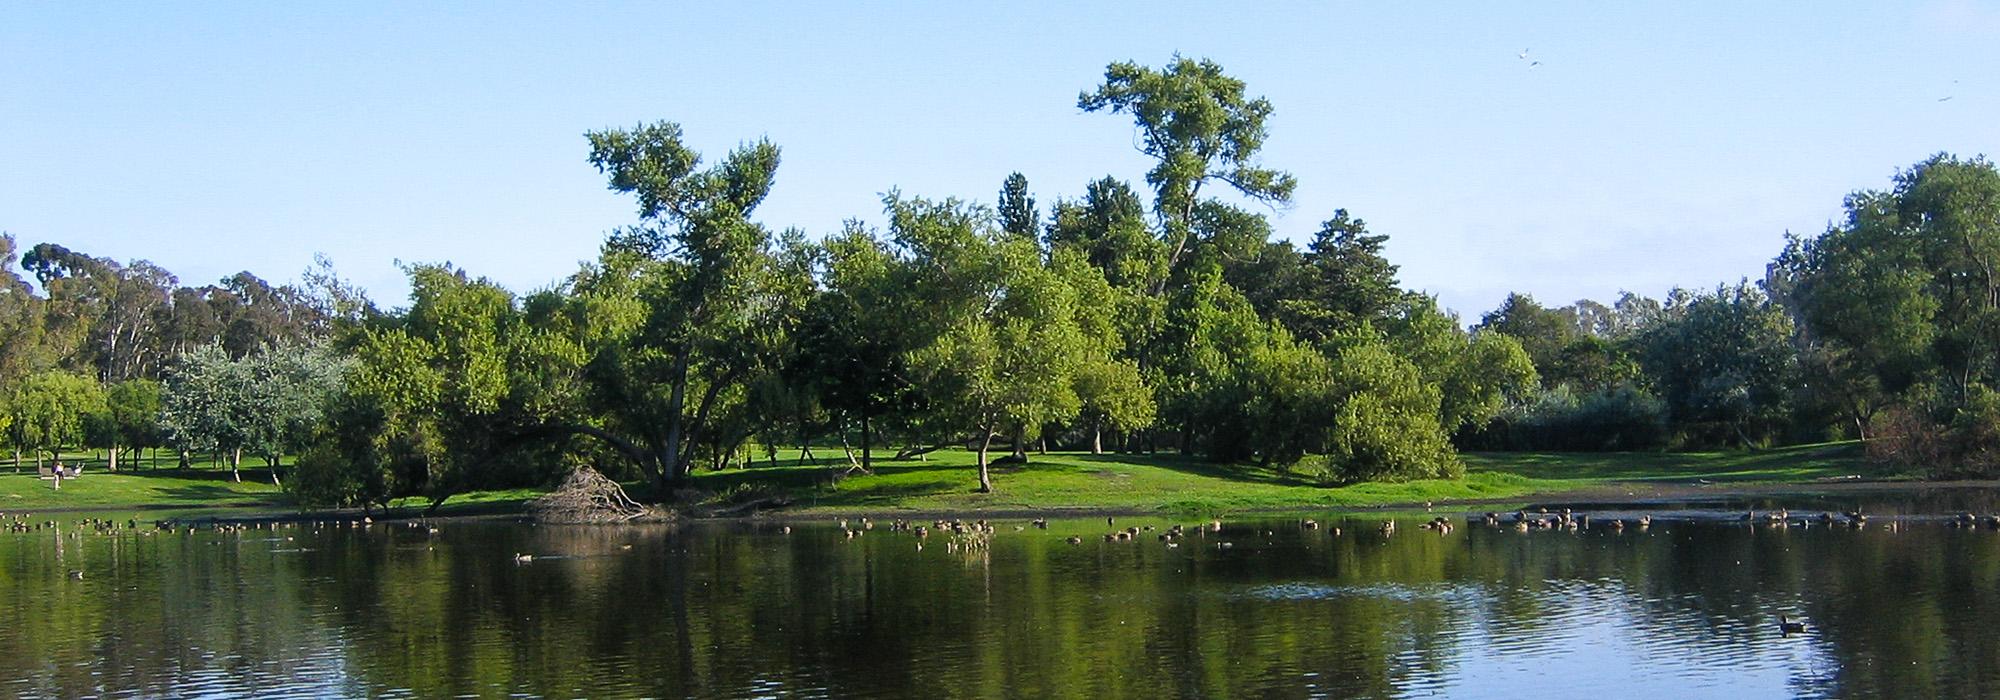 HuntingtonBeachCentralPark_WikimediaCommons.jpg